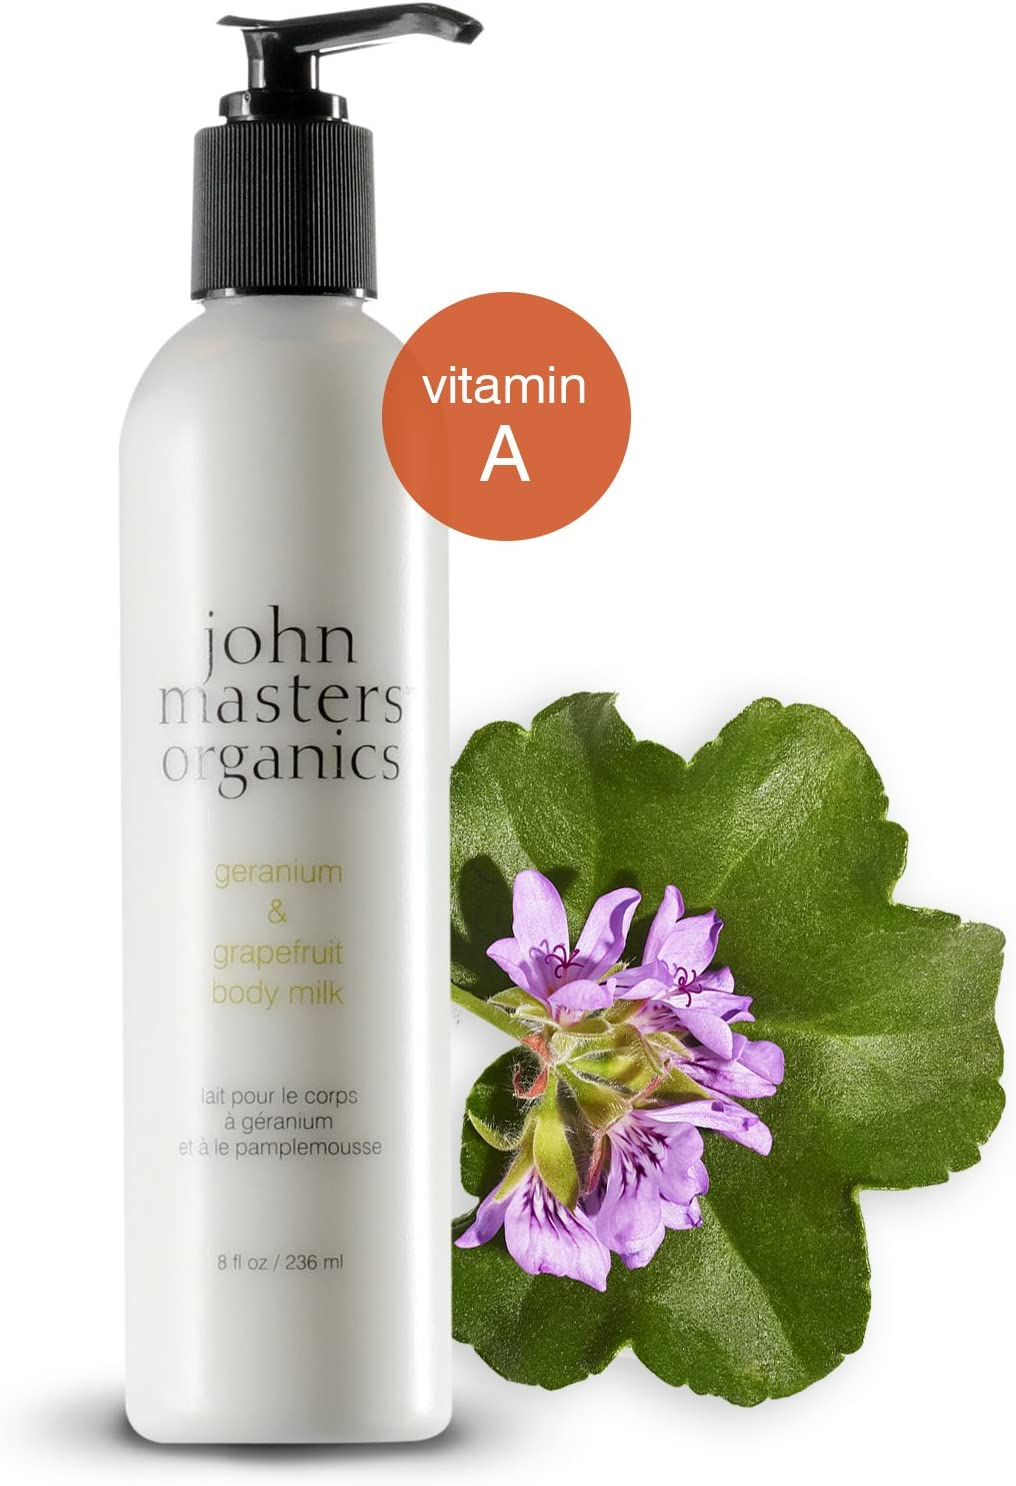 John Masters Organics - Geranium & Grapefruit Body Milk - Light Body Lotion to Hydrate, Moisturize & Soothe Skin with Coconut Oil, Aloe Vera & Vitamin C for All Skin Types - 8 oz